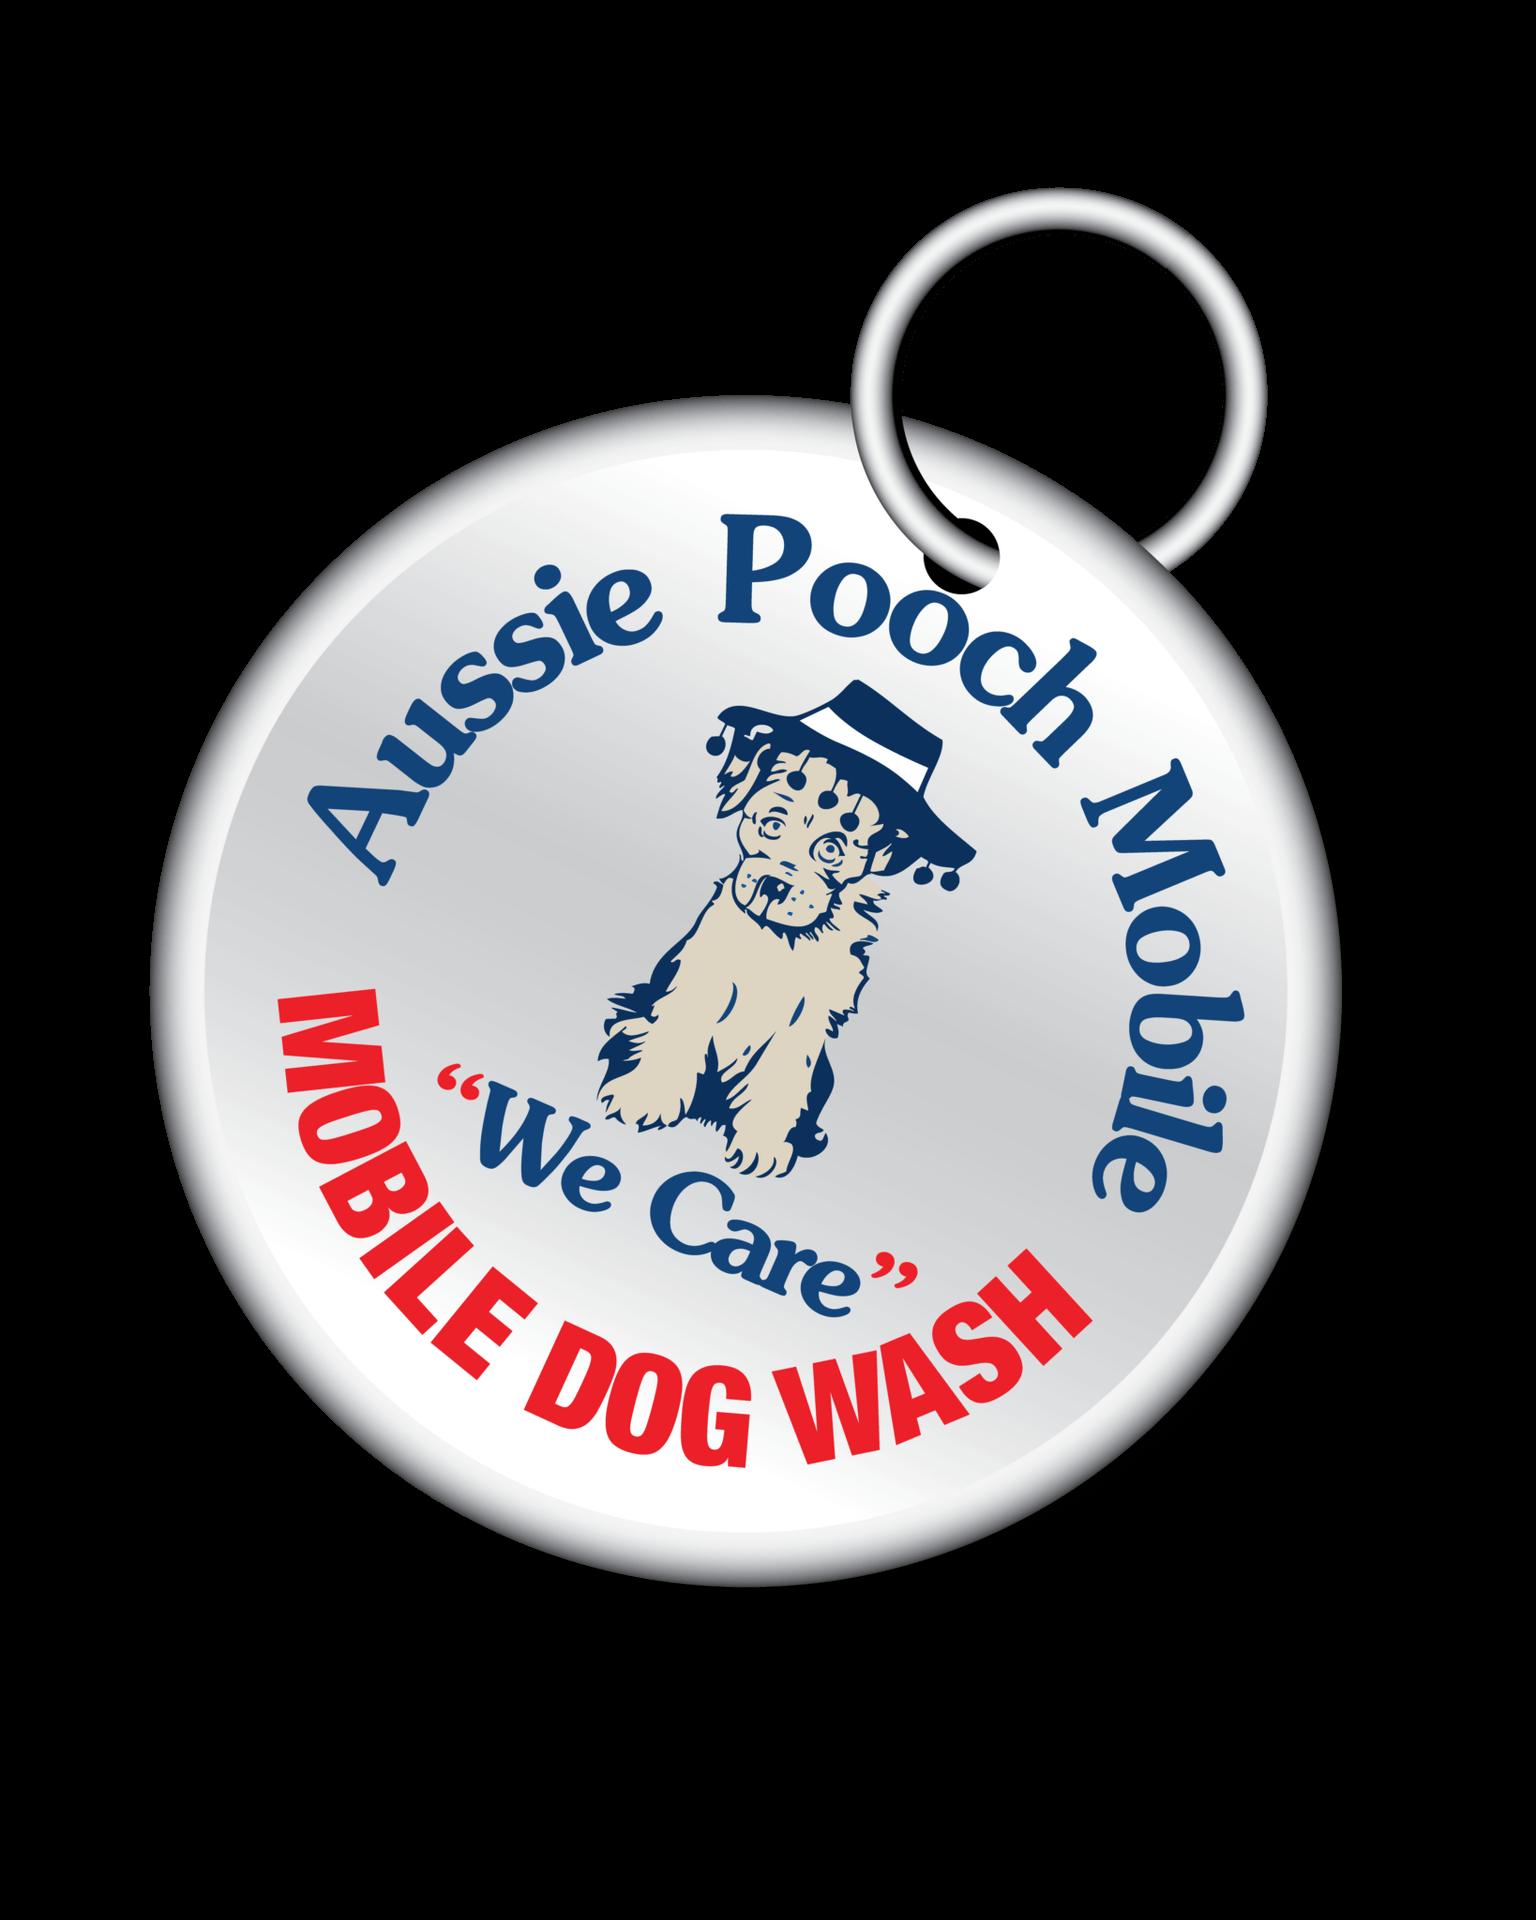 The Aussie Pooch Mobile Pty Ltd